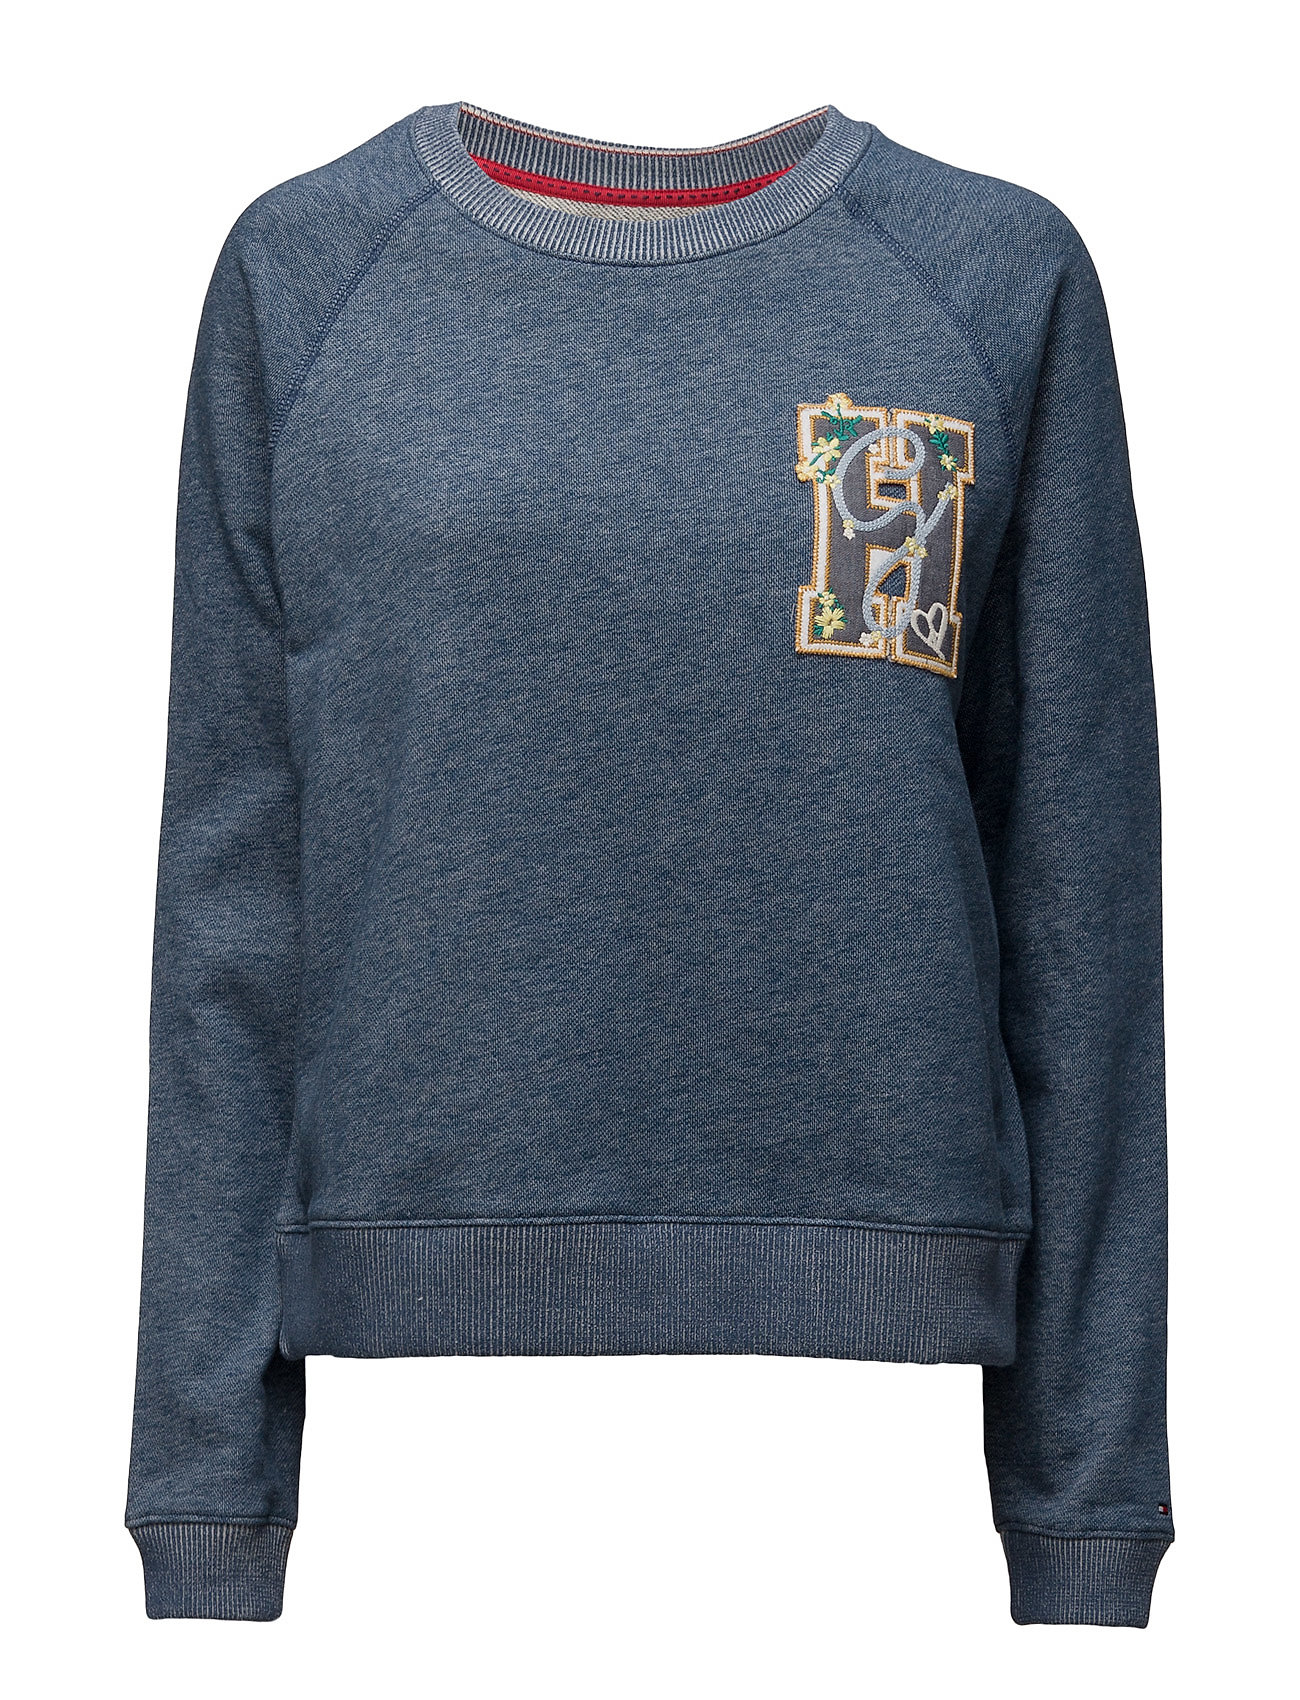 Tommy Hilfiger Cotton Sweatshirt Gigi Hadid